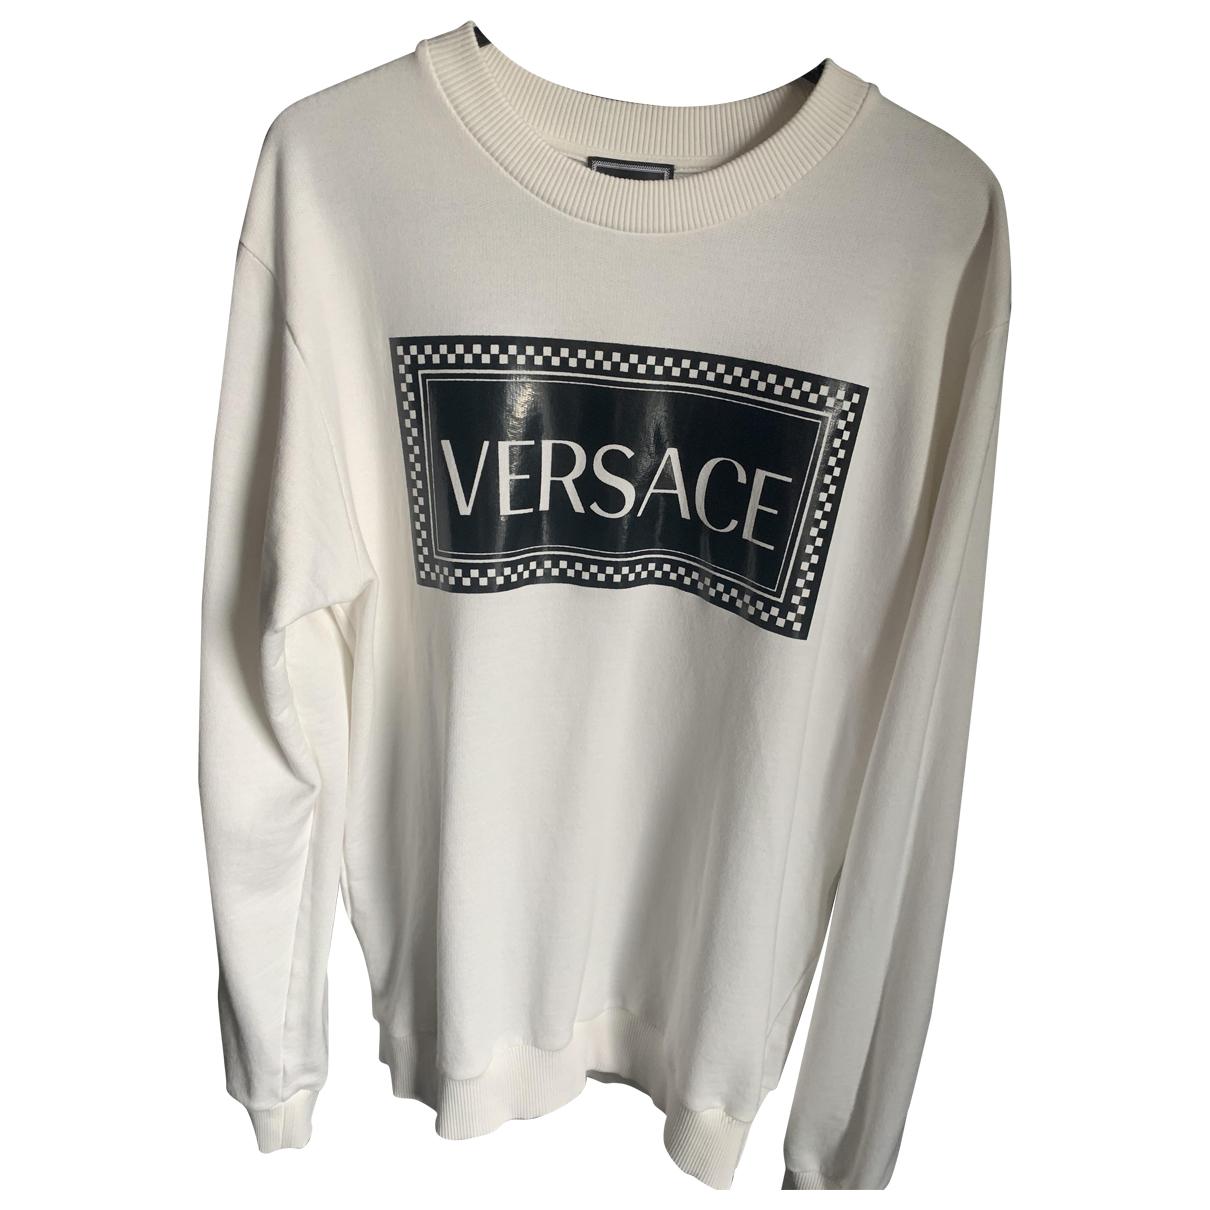 Versace \N White Cotton Knitwear & Sweatshirts for Men S International